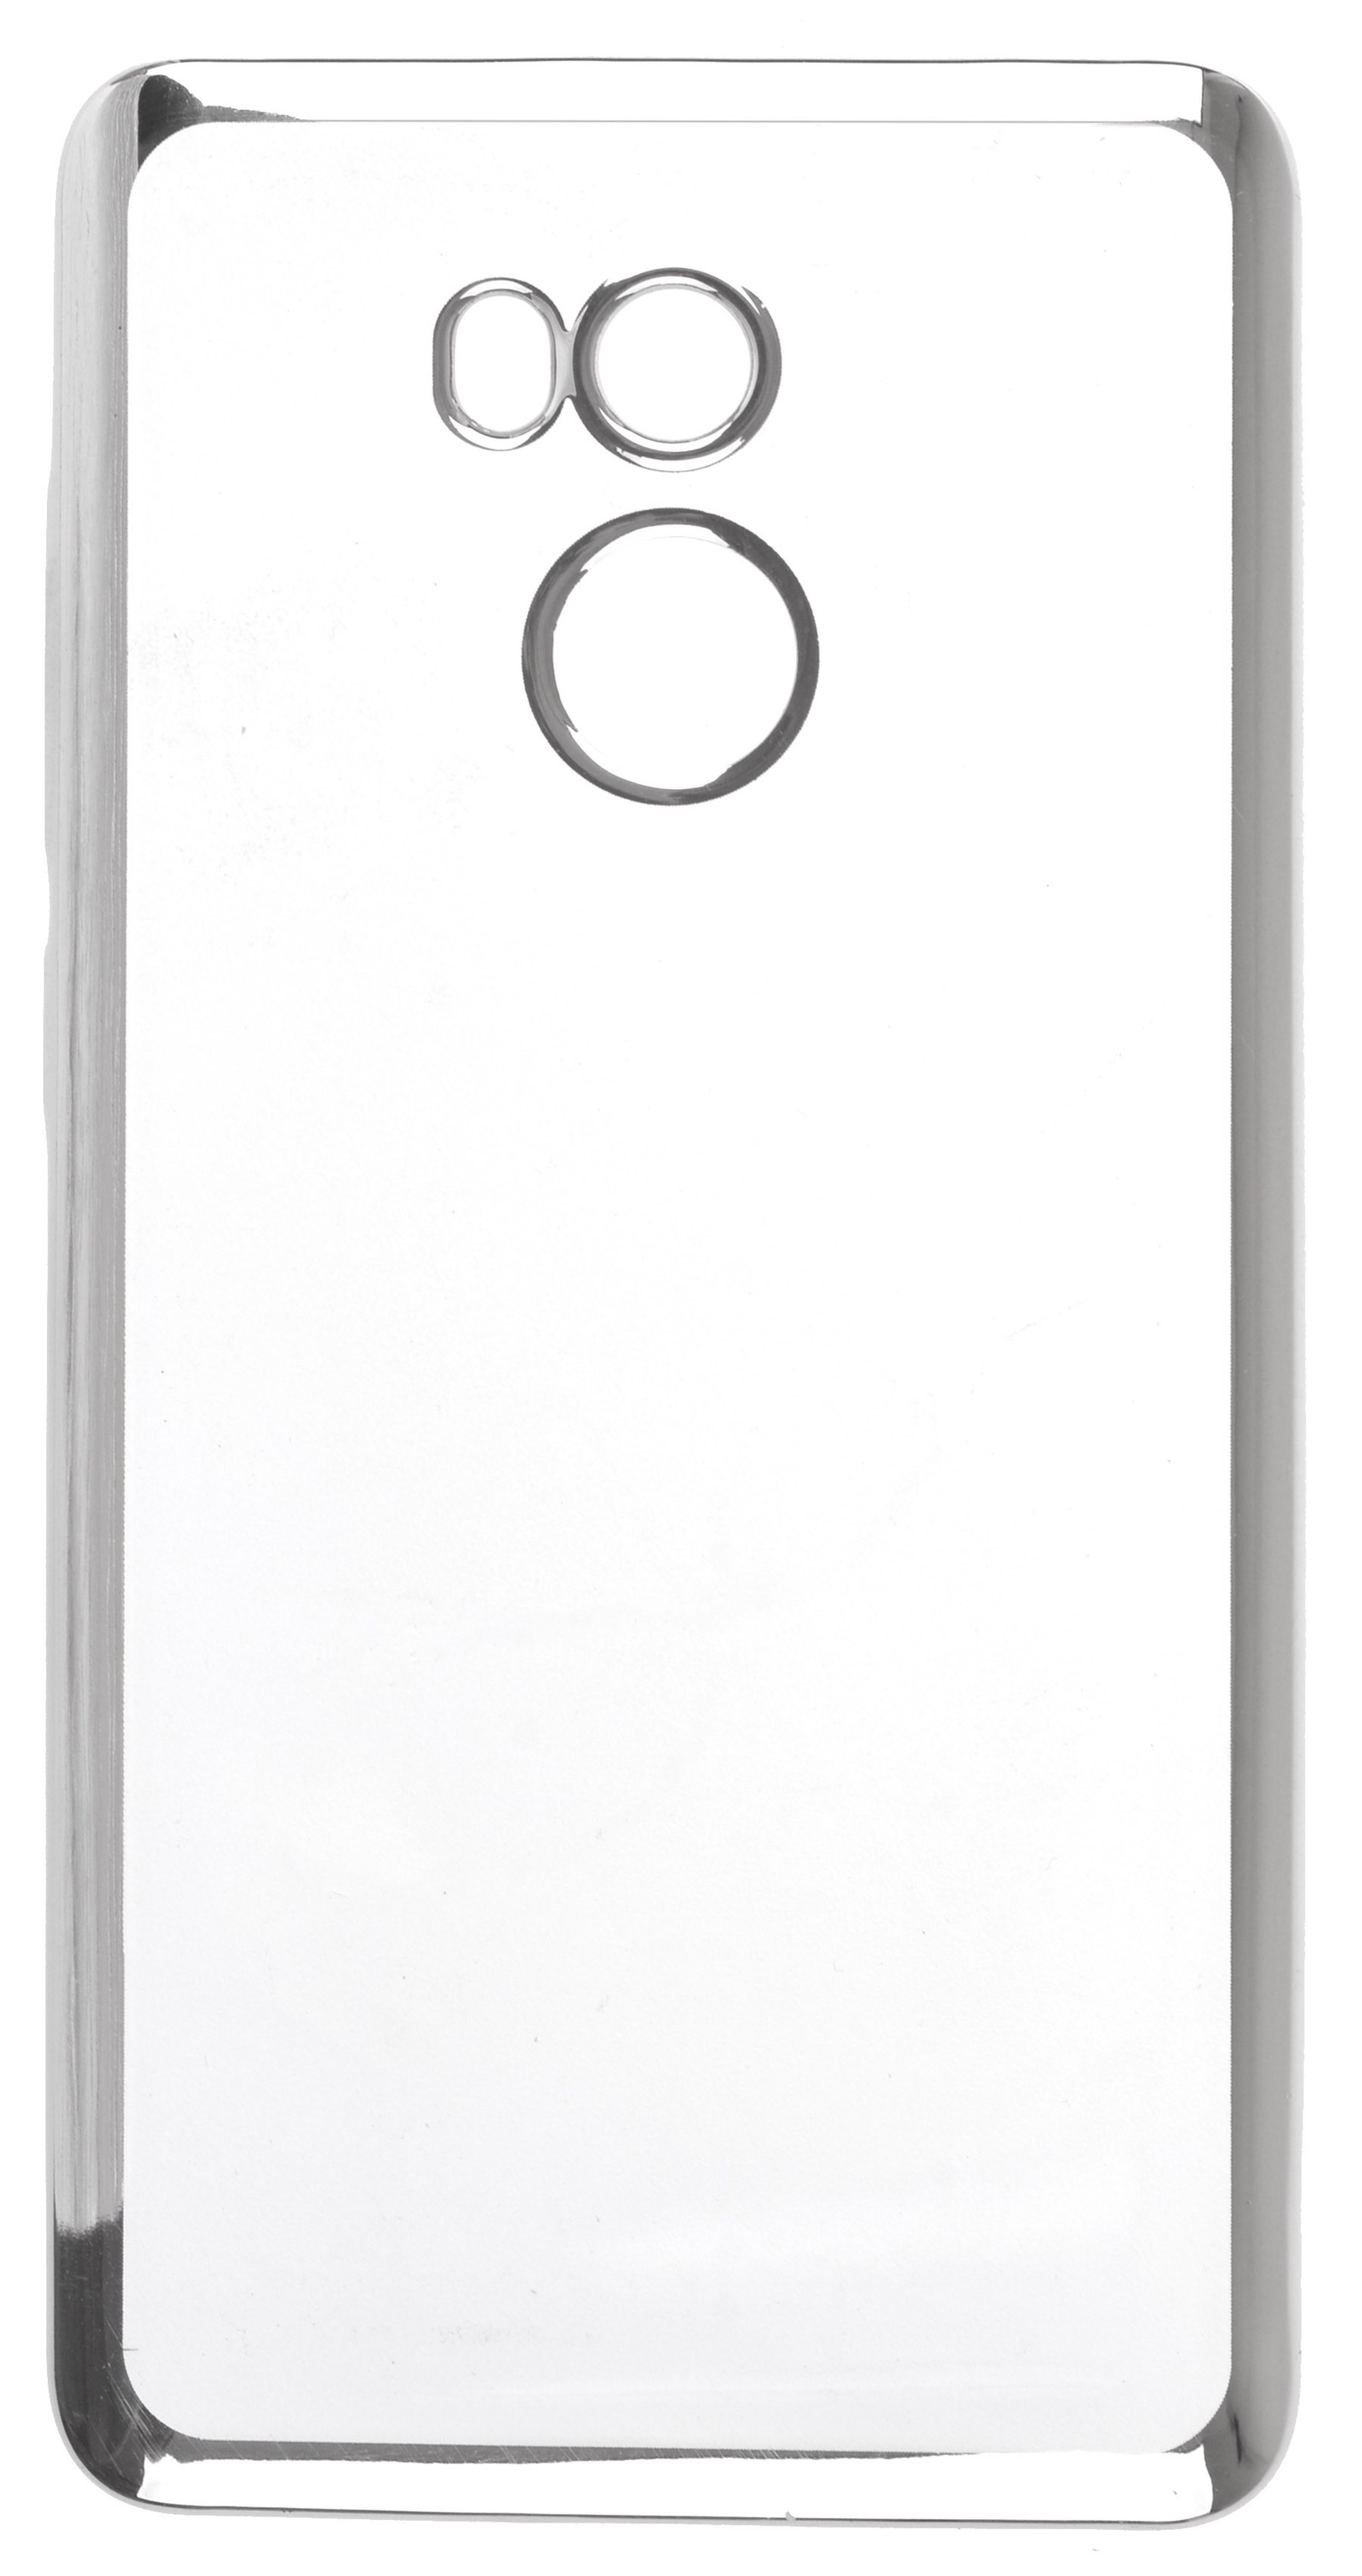 Чехол для сотового телефона skinBOX Silicone chrome border, 4630042529410, серебристый чехол для сотового телефона skinbox silicone chrome border 4630042528697 серебристый